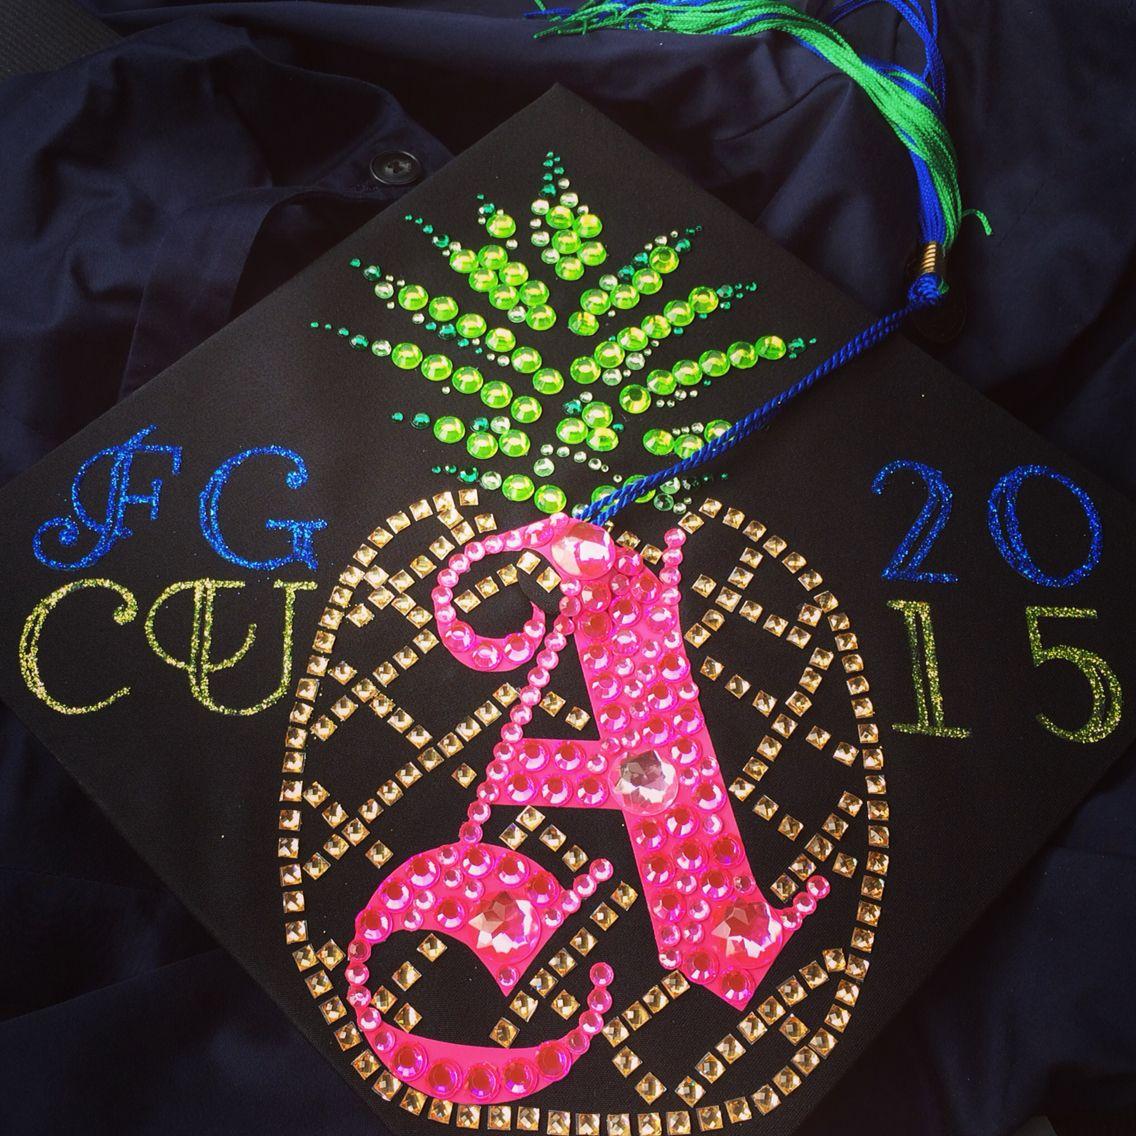 how to decorate graduation cap with cricut